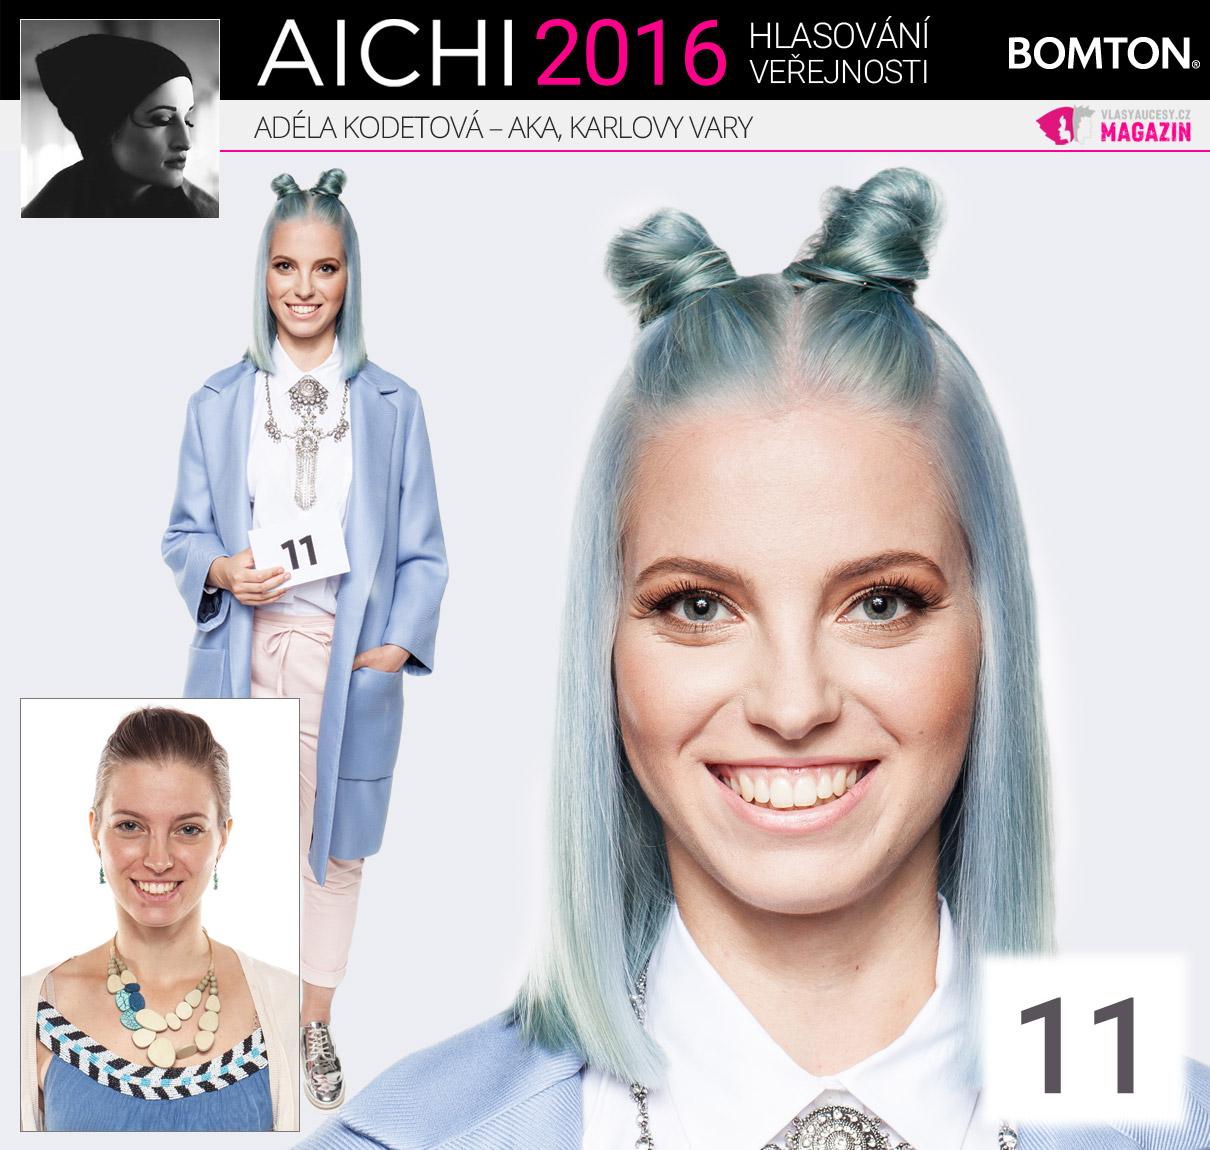 Finále AICHI 2016: Adéla Kodetová - AKA, Karlovy Vary